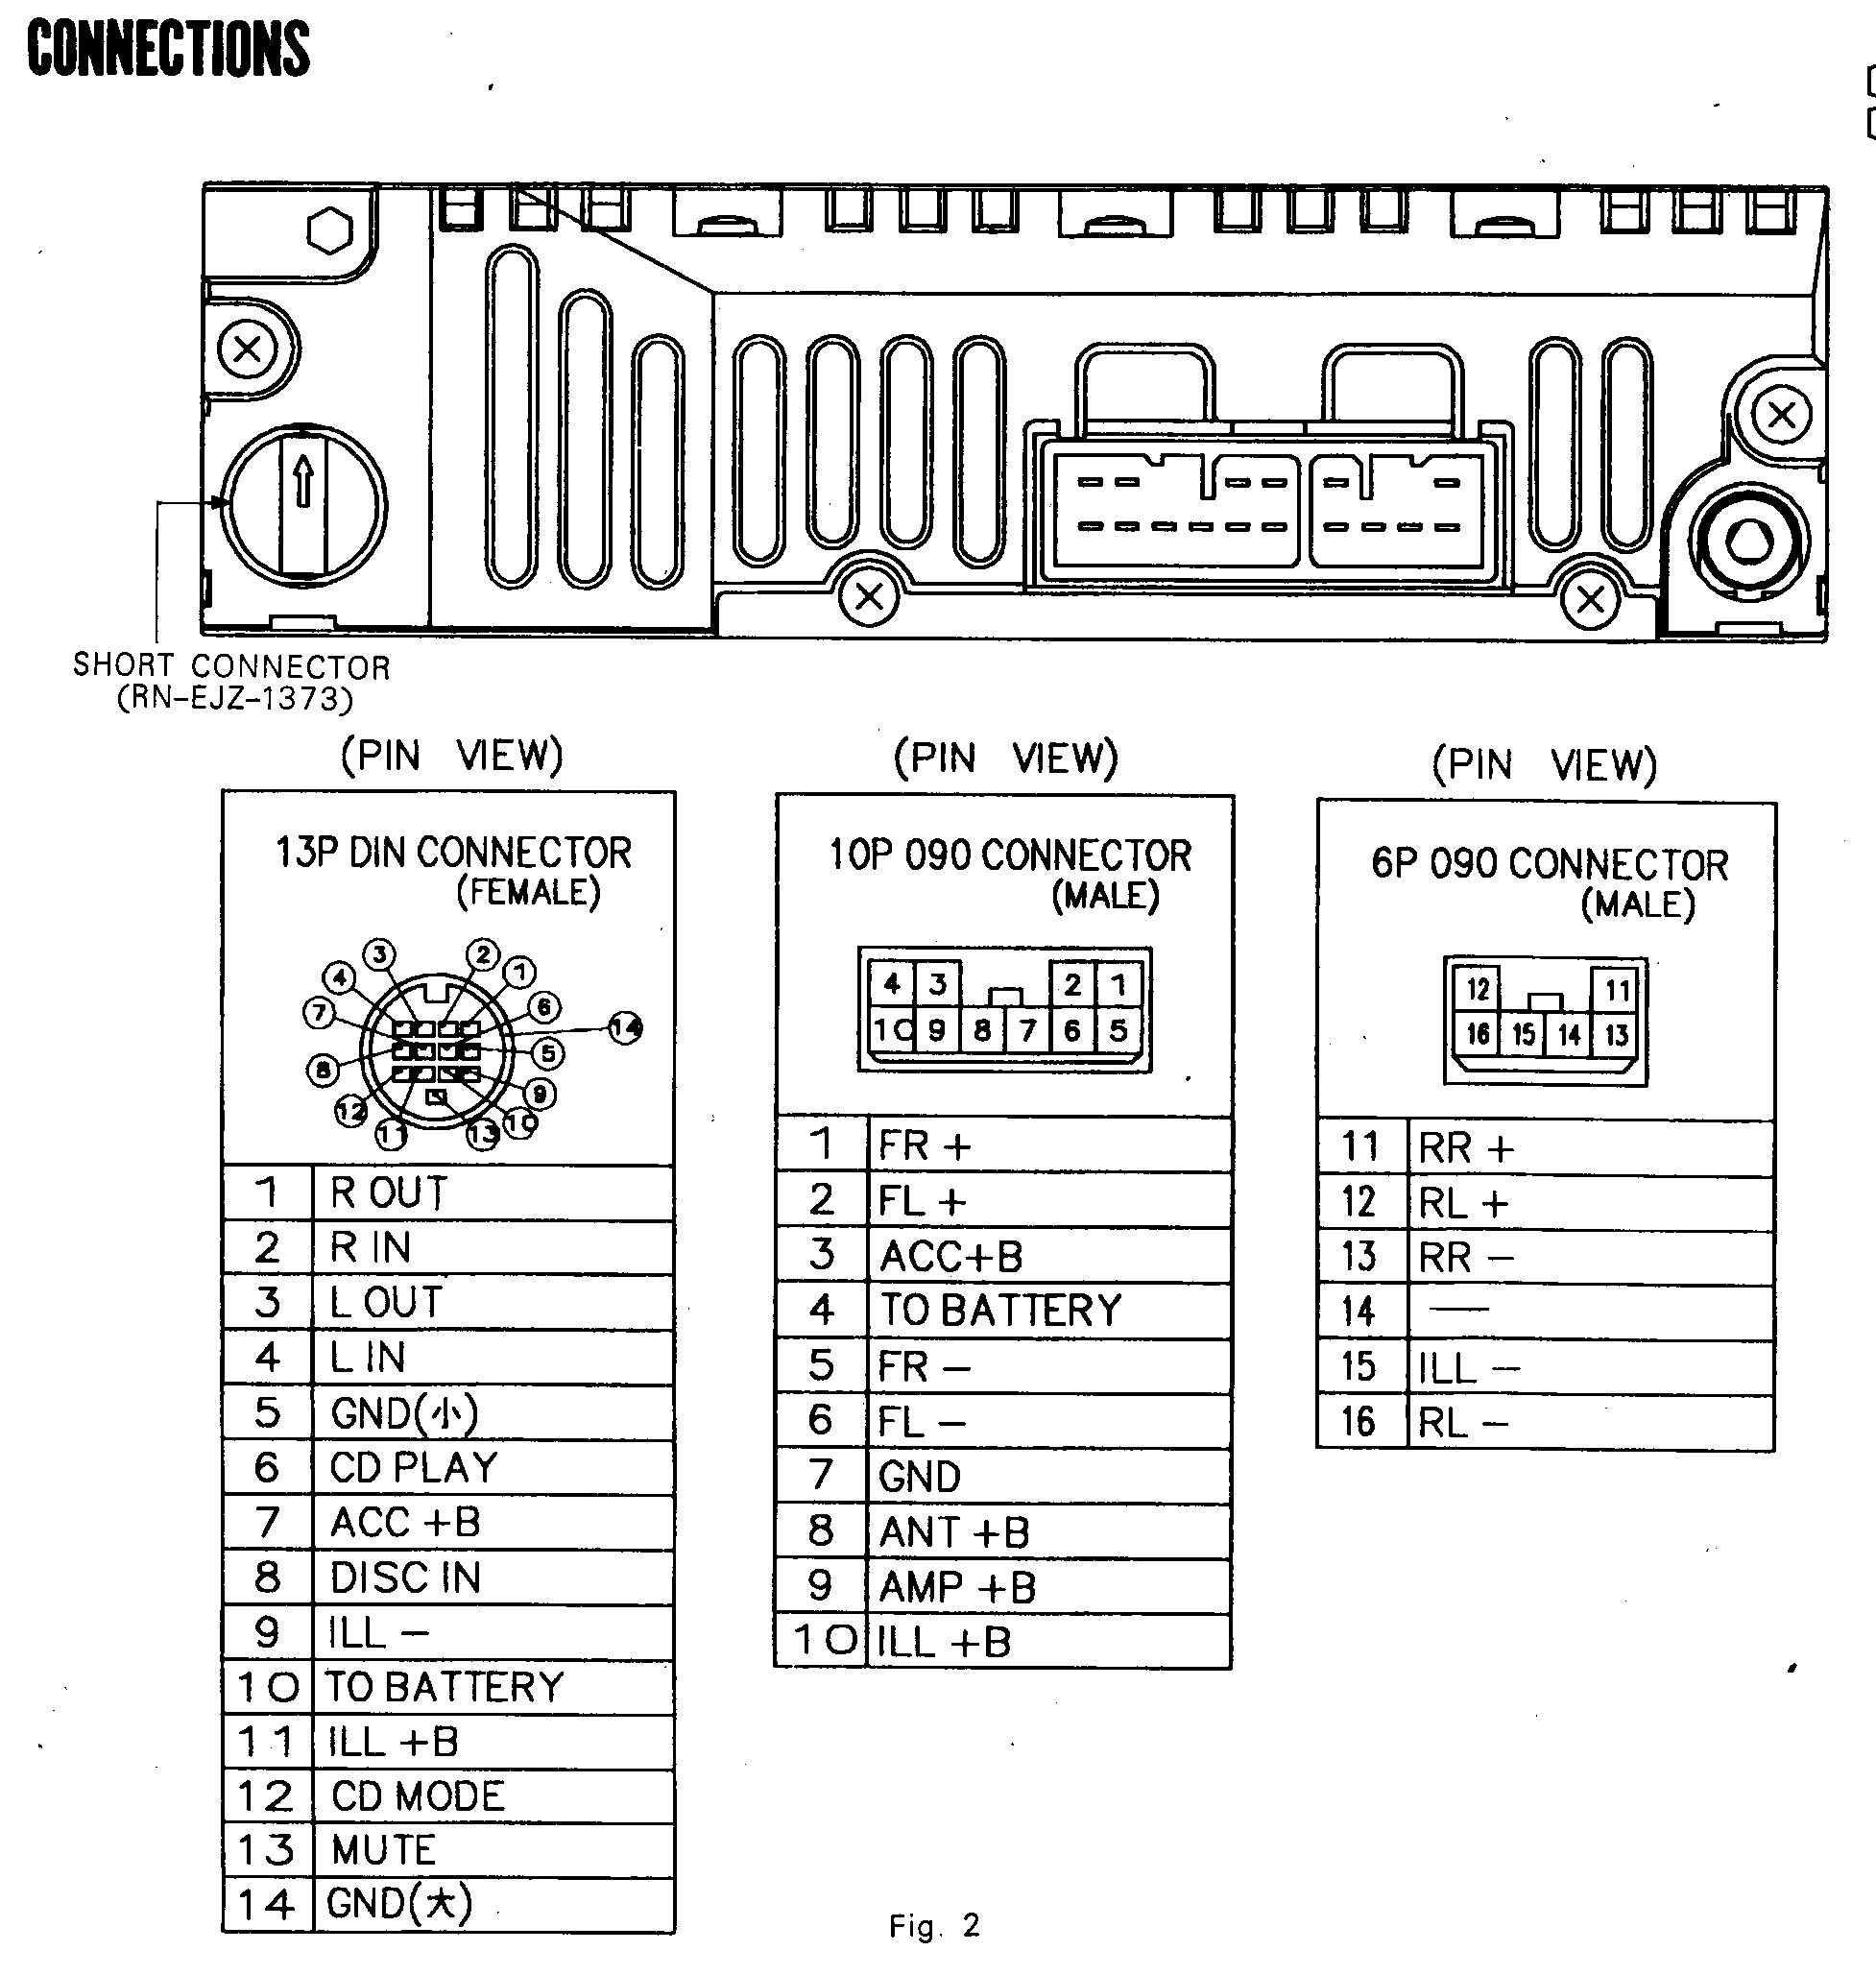 1990 celica wiring diagrams - Toyota Nation Forum : Toyota ...